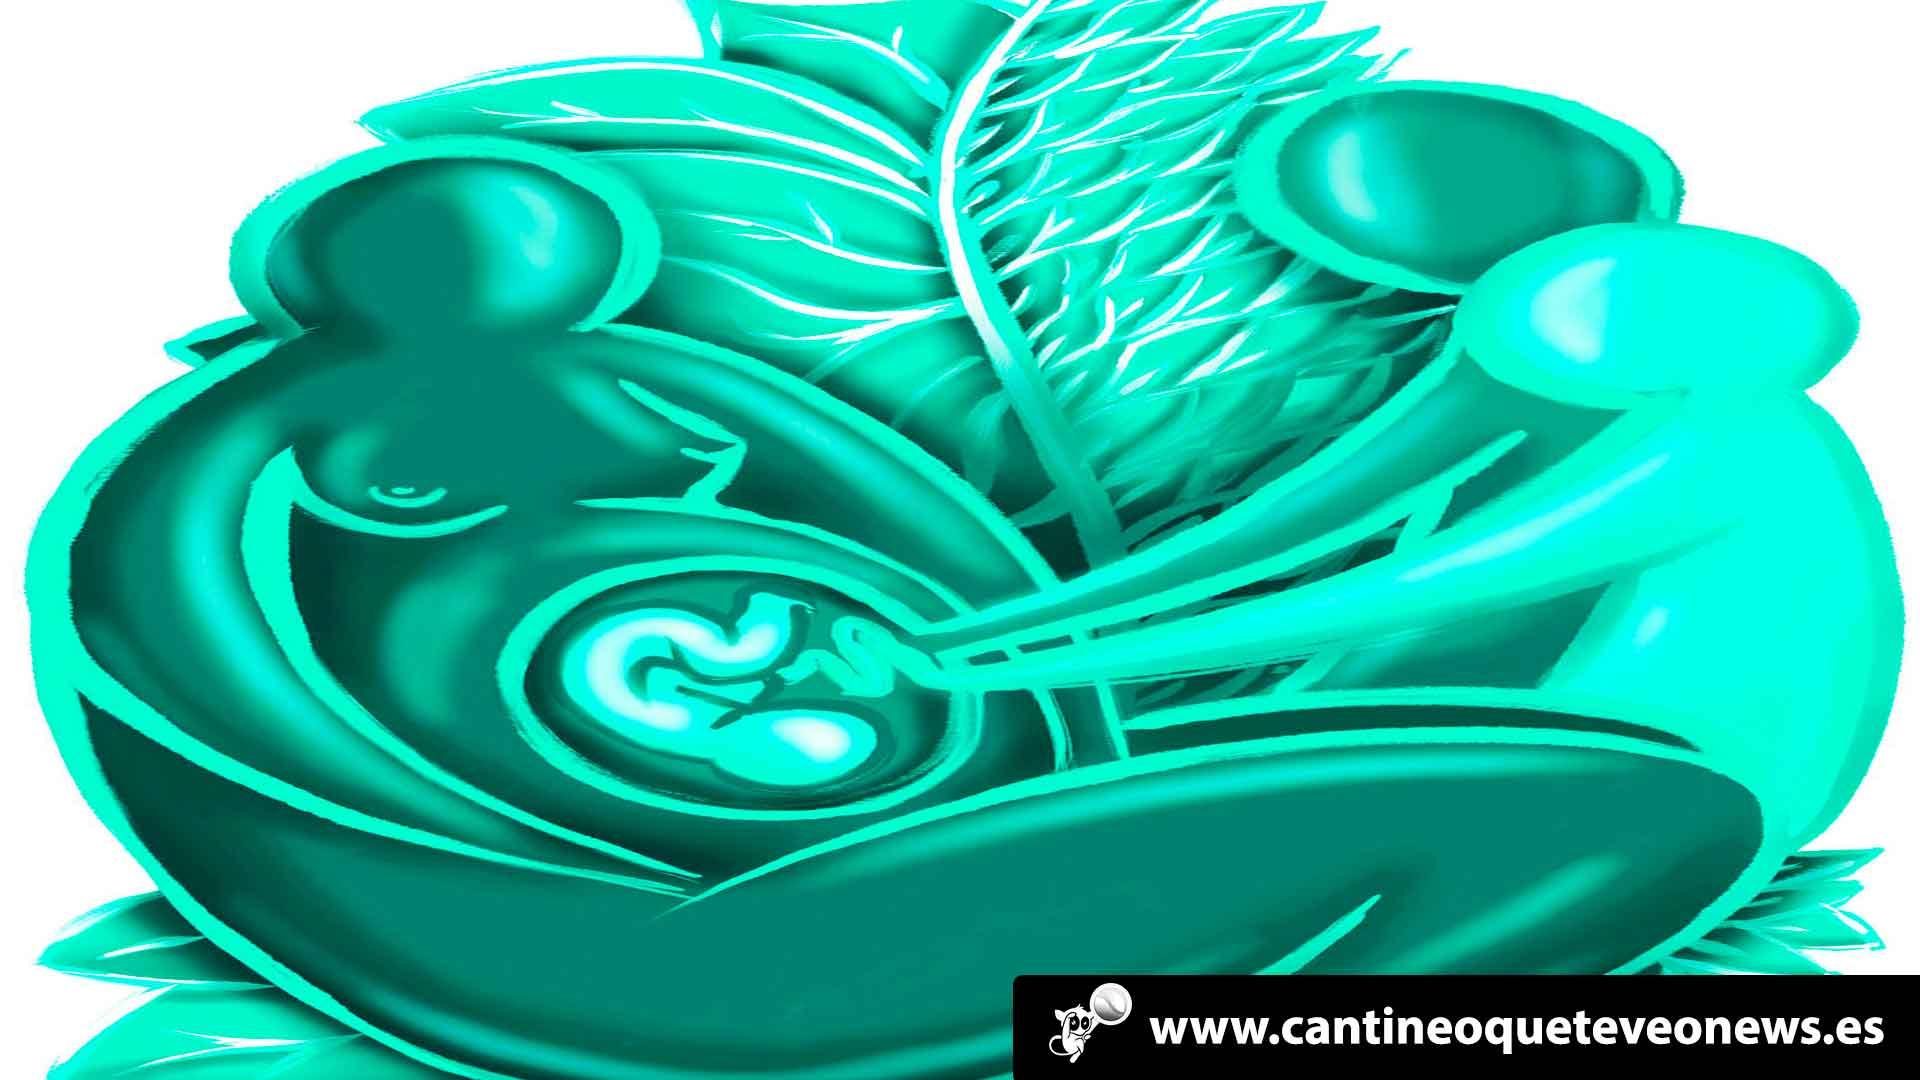 Cantineoqueteveo News - Vientres en Alquiler